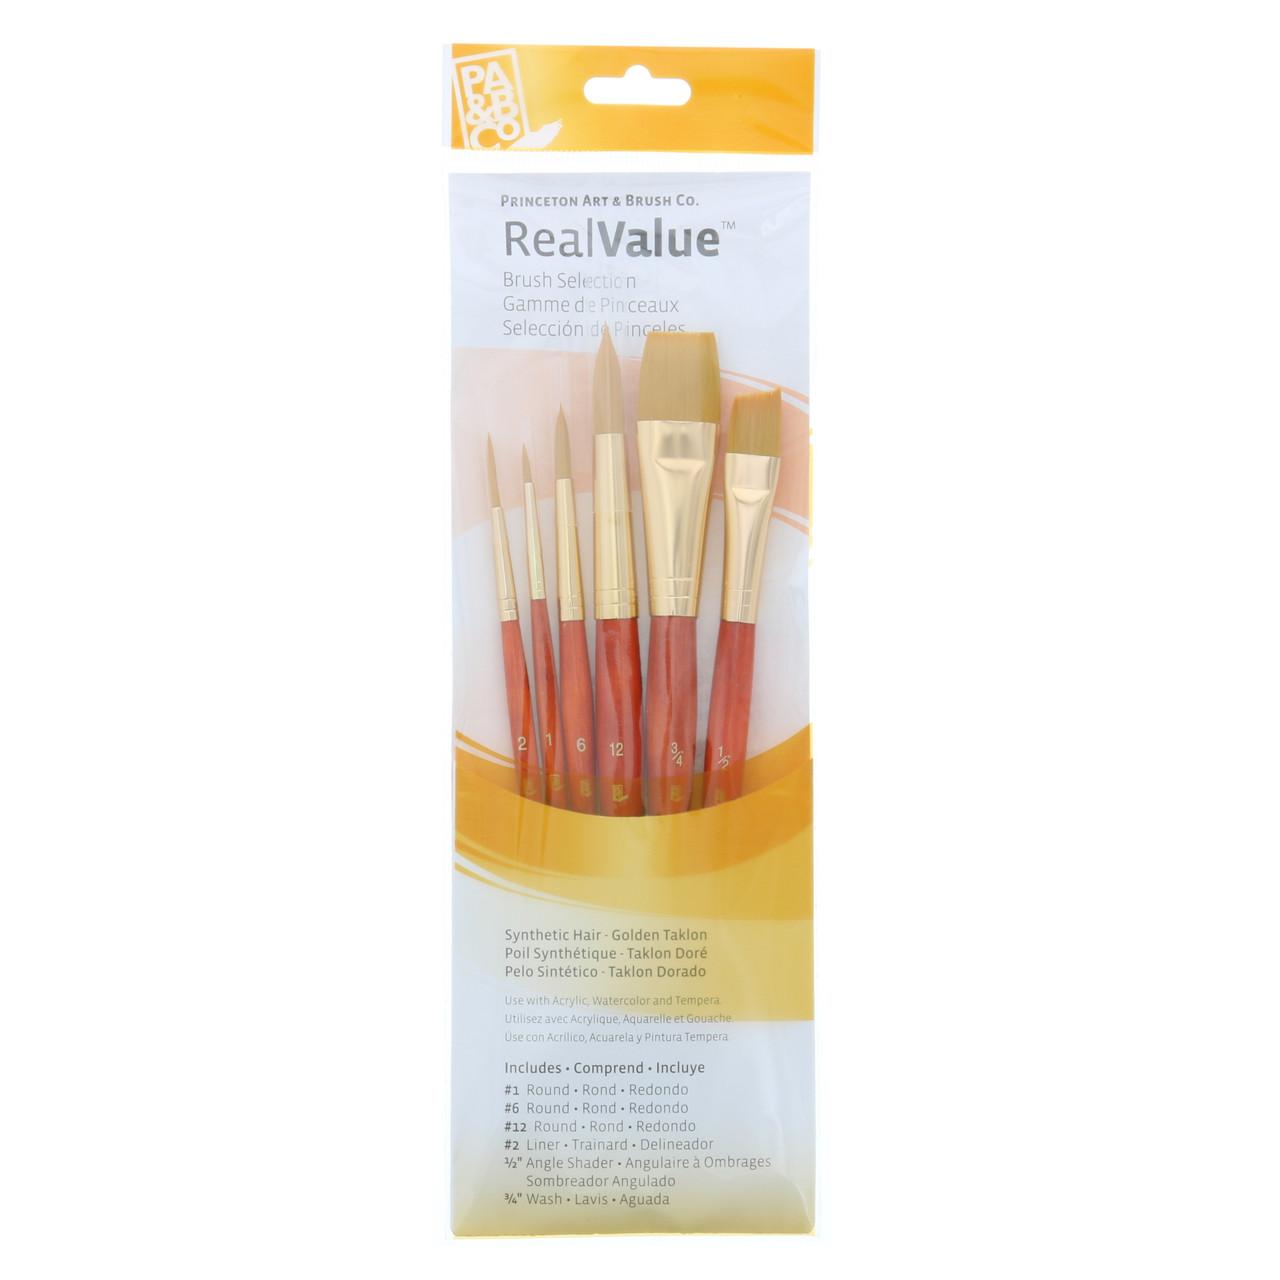 Synthetic Golden Taklon 6-Brush Set Round 1, 6, 12, Liner 2, Angle Shader 1/2, Wash 3/4